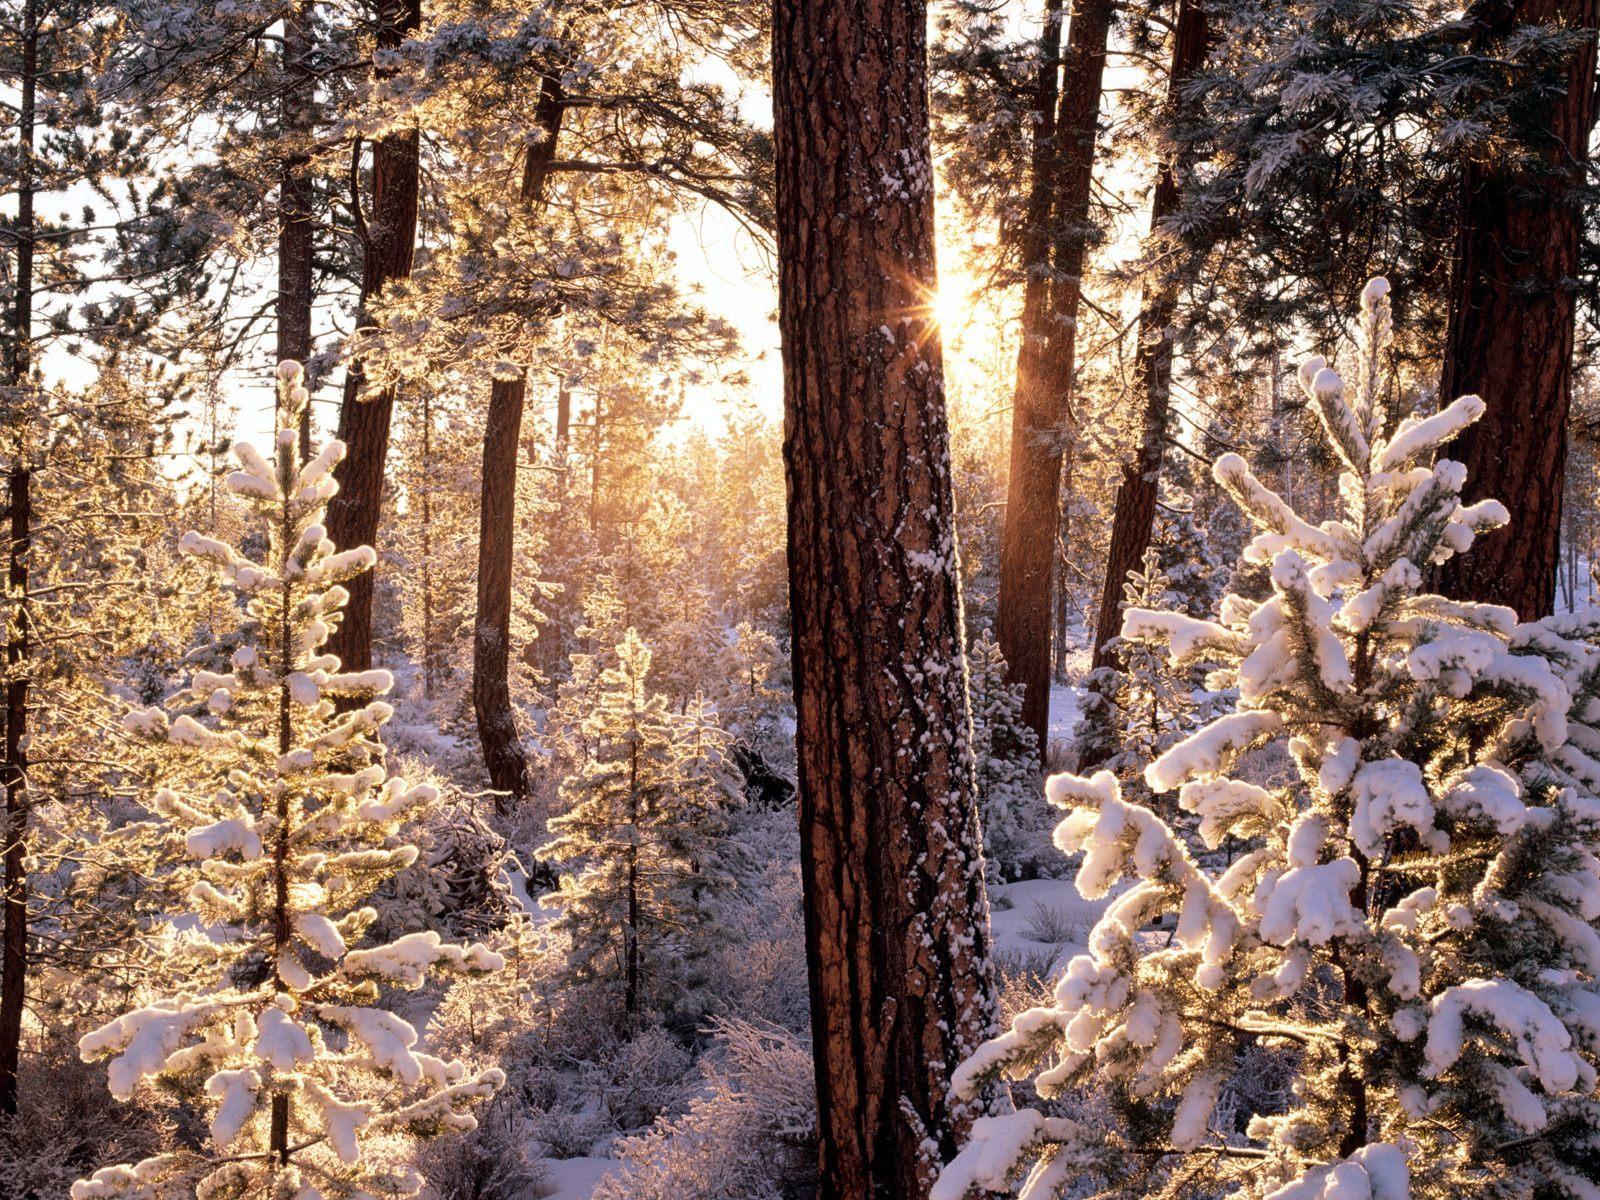 12312 descargar fondo de pantalla Paisaje, Invierno, Árboles, Nieve, Abetos: protectores de pantalla e imágenes gratis